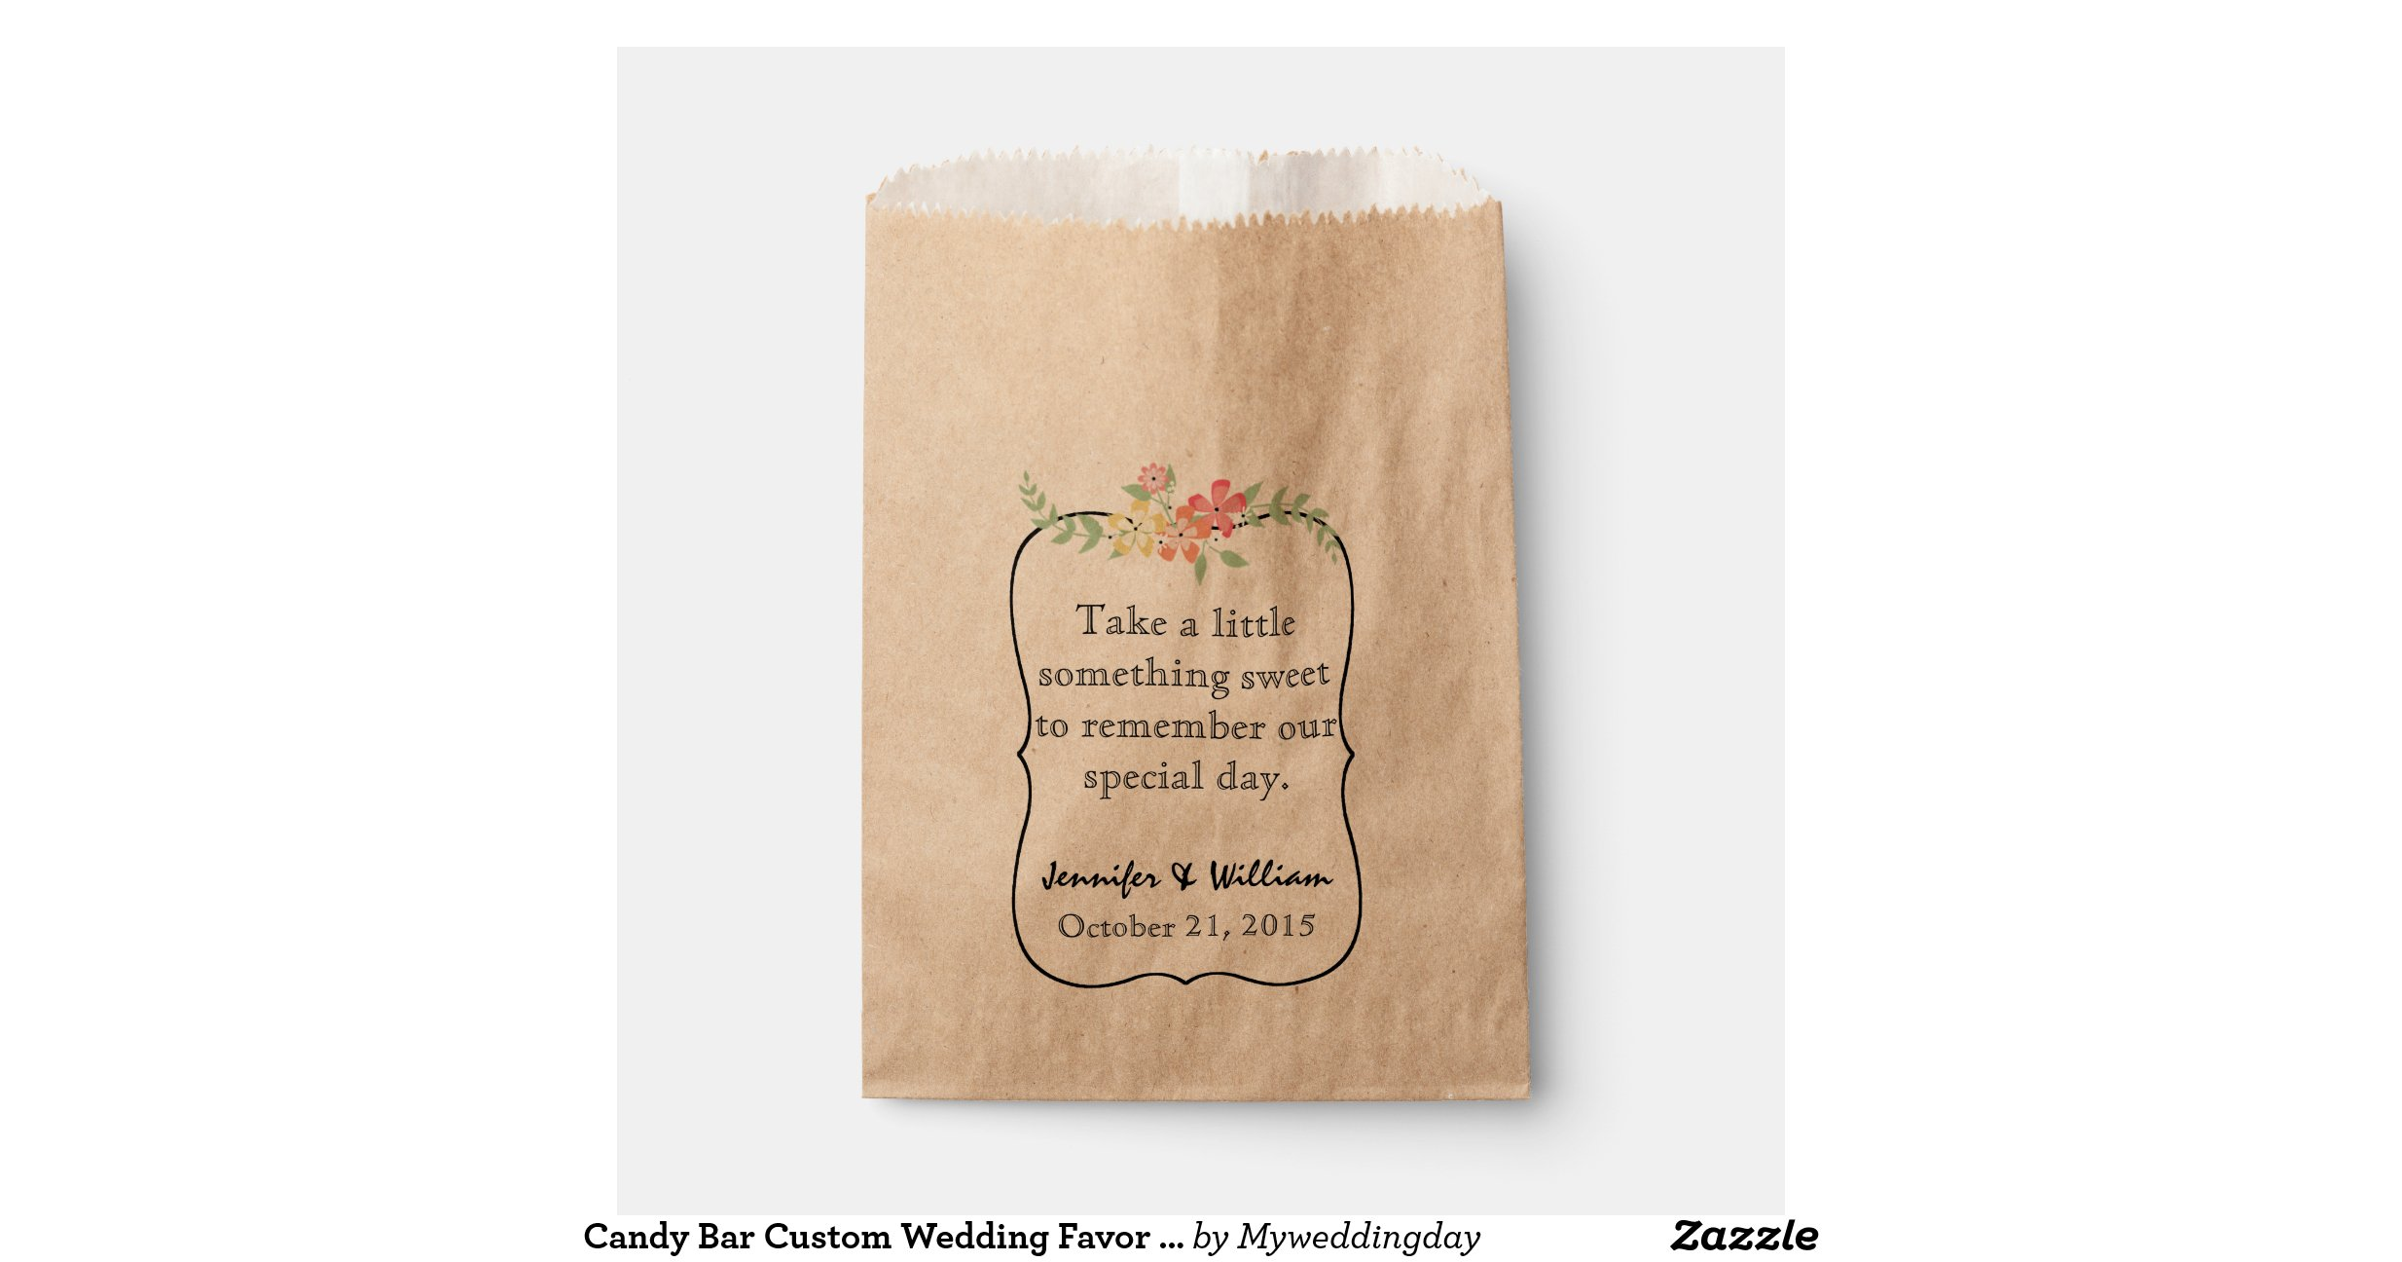 Candy Bar Custom Wedding Favor Bag Favor Bags R660bcb06e9734b268ba3b585d406d7f9 Zdp64 1200